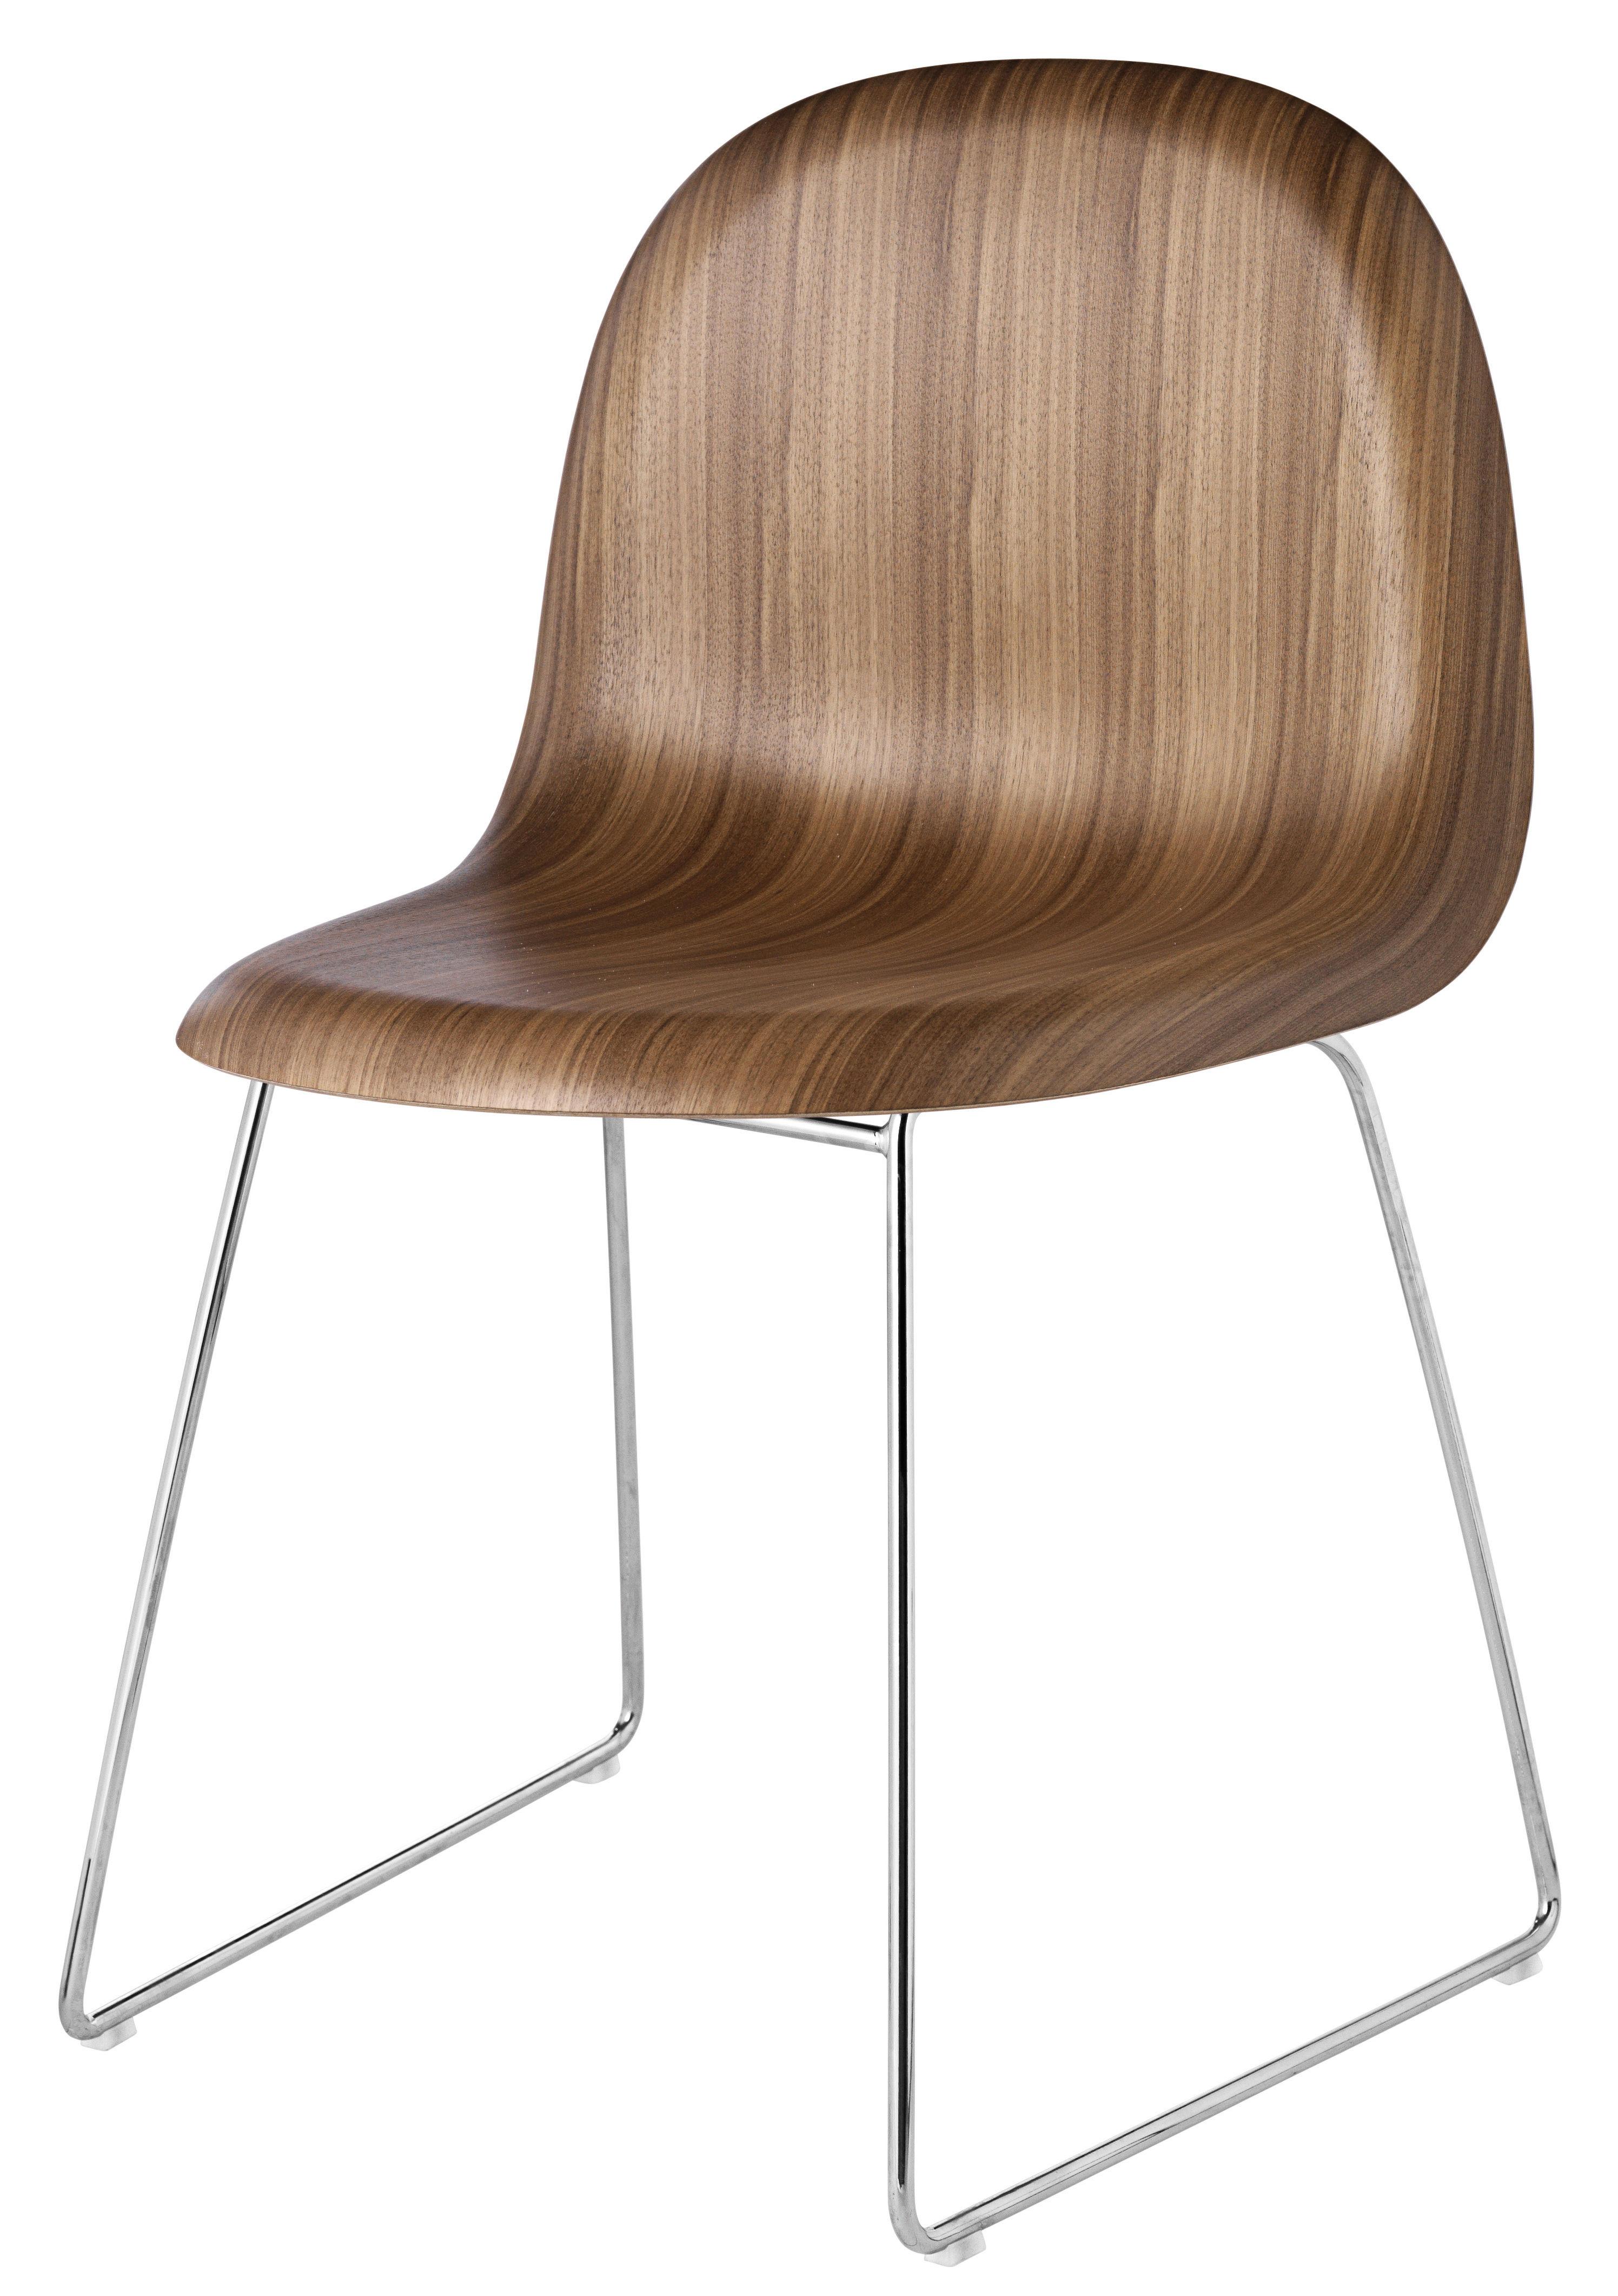 Furniture - Chairs - 3D Chair - Walnut shell & metal legs by Gubi - Walnut - Chrome legs - Chromed steel, Walnut plywood